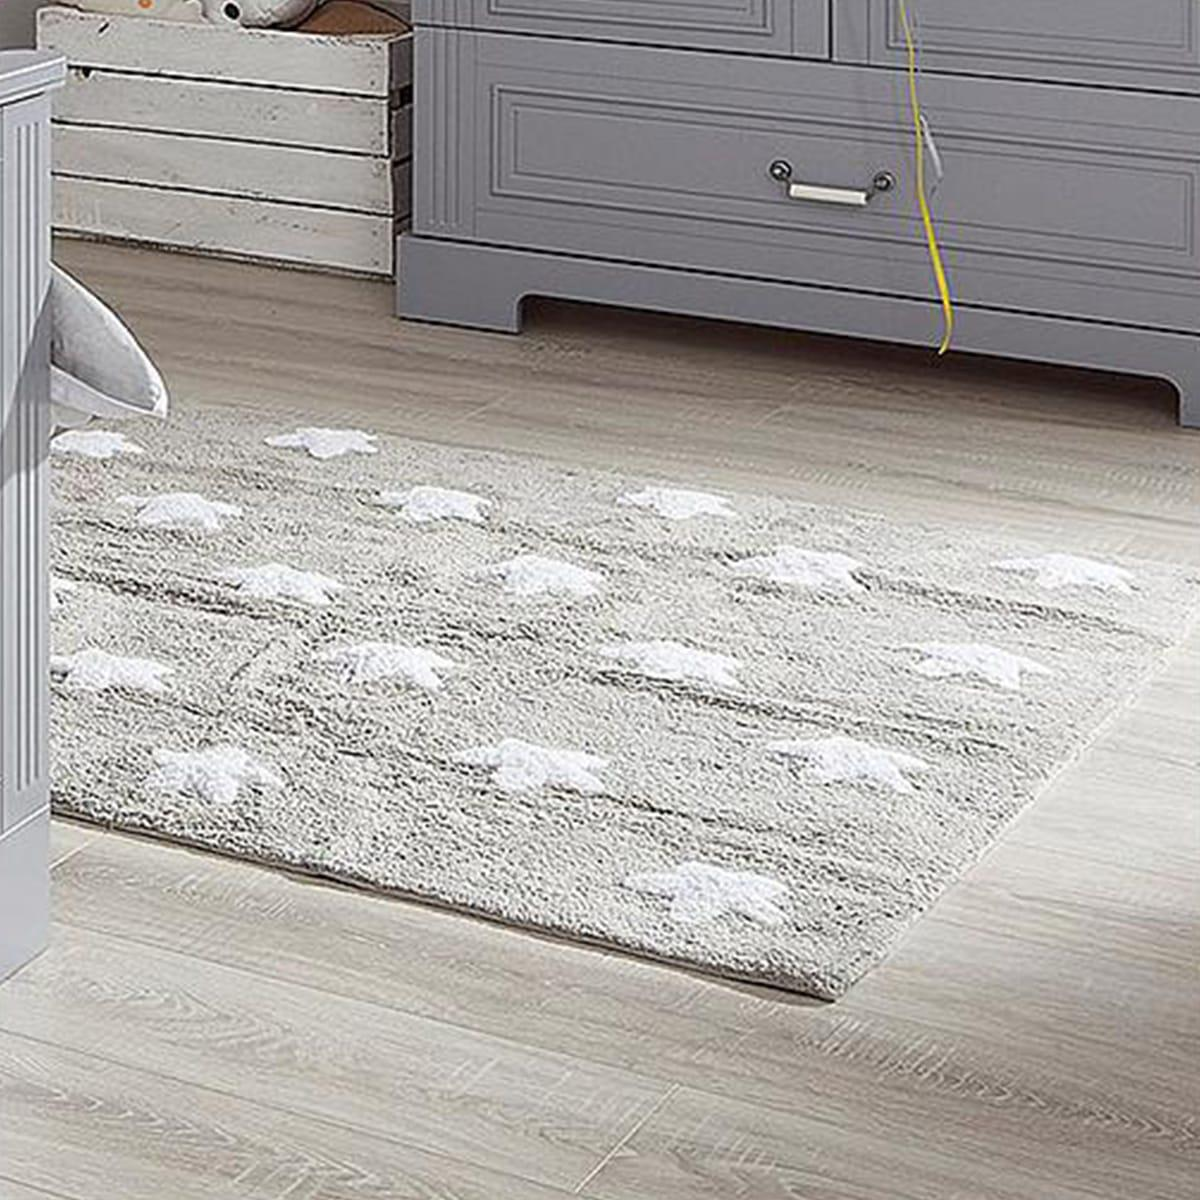 Tapis 120x160cm STARS Lorena Canals grey-white